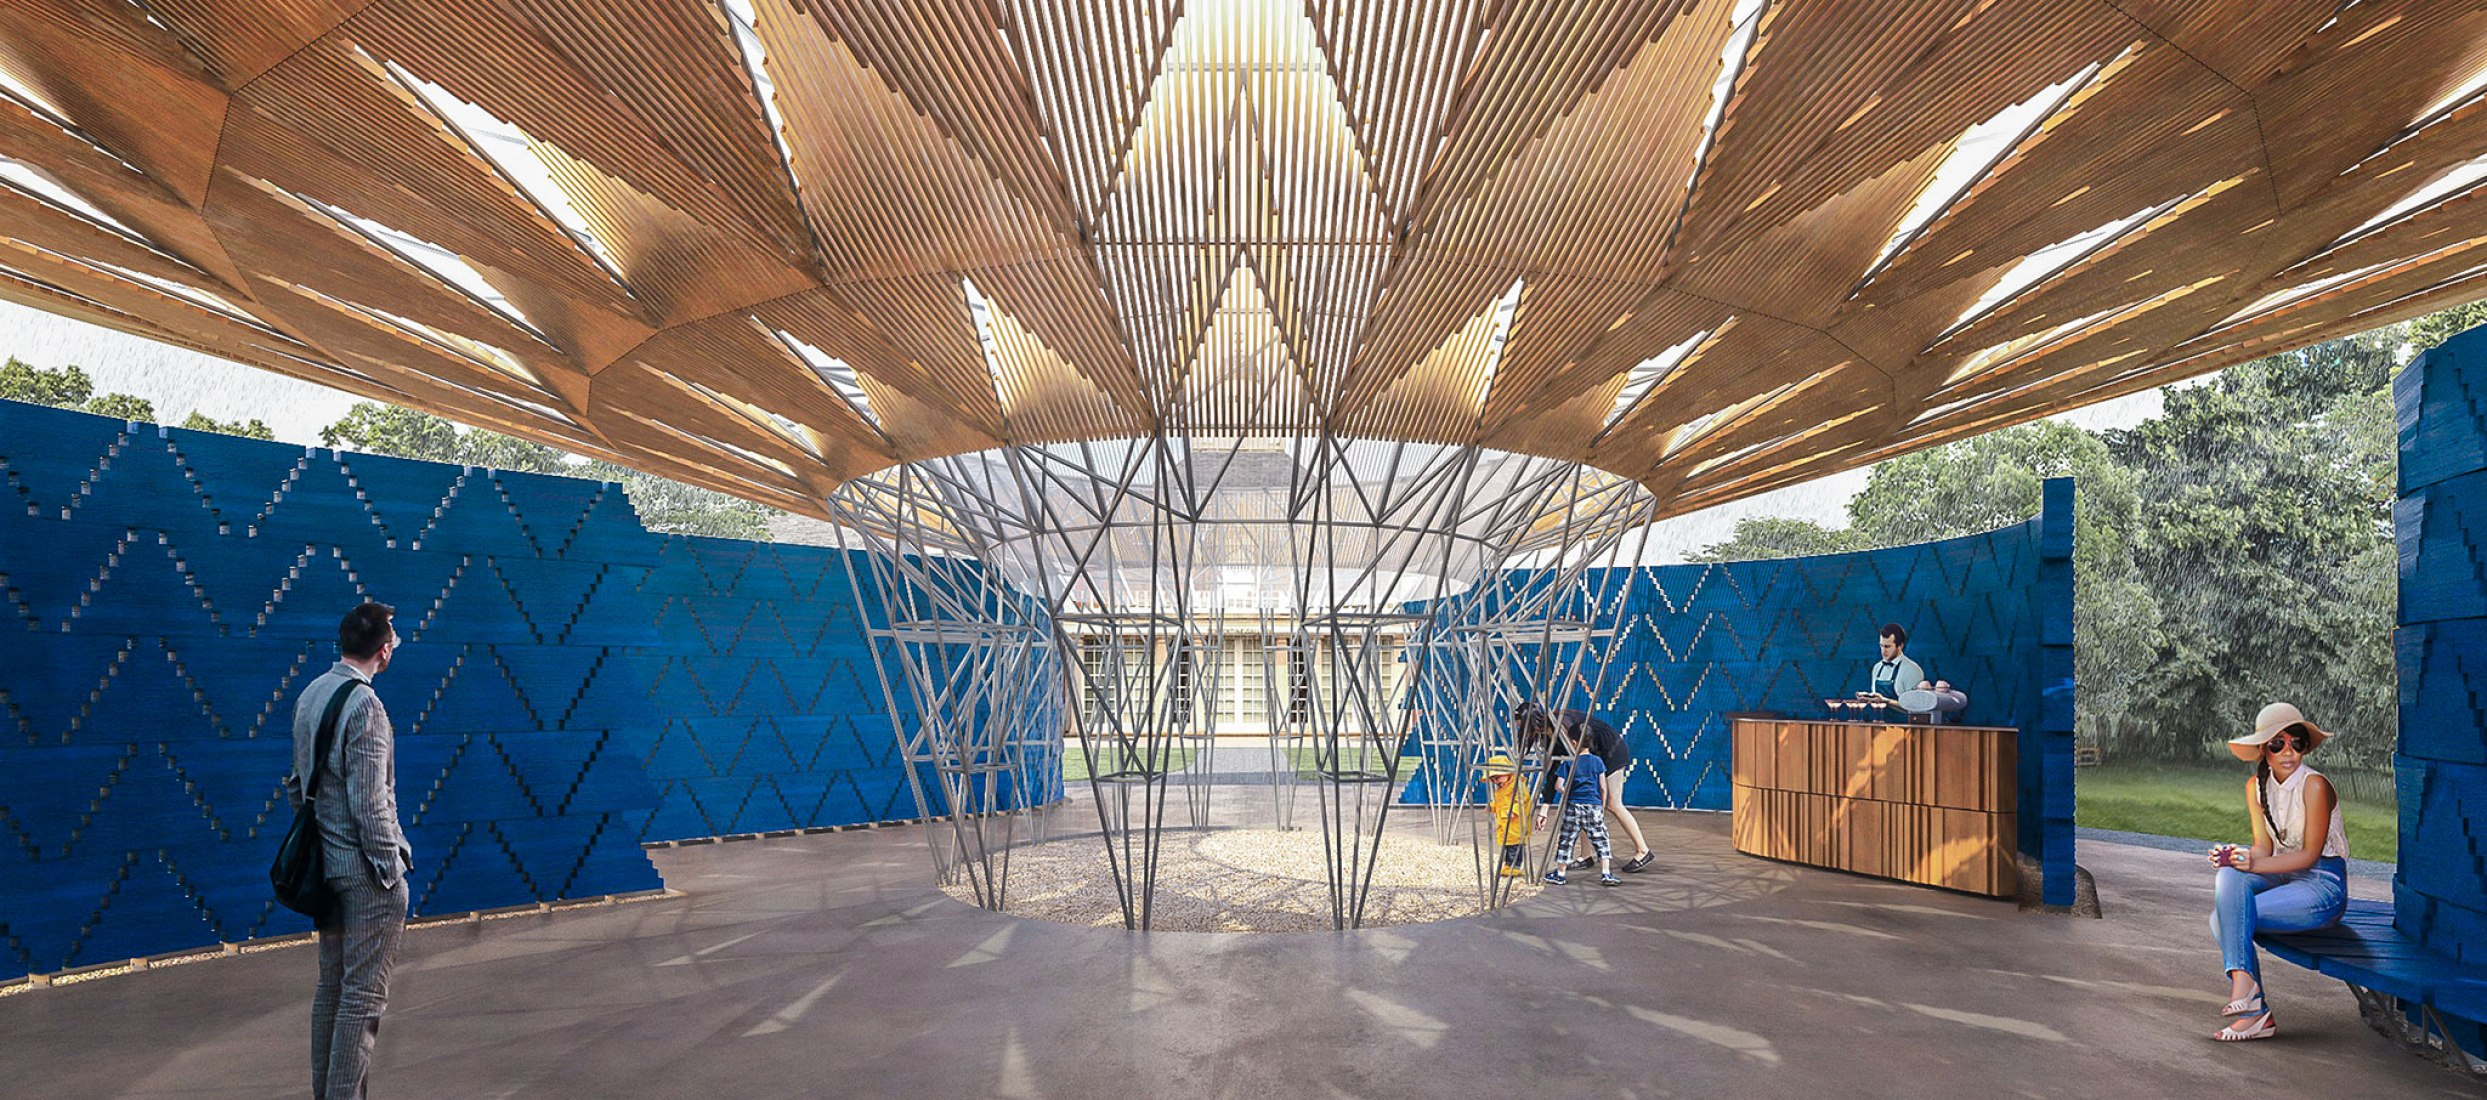 Serpentine Pavilion 2017, Designed by Francis Kéré, Design Render, Interior. Image ©Kéré Architecture. Image courtesy of Serpentine Galleries.